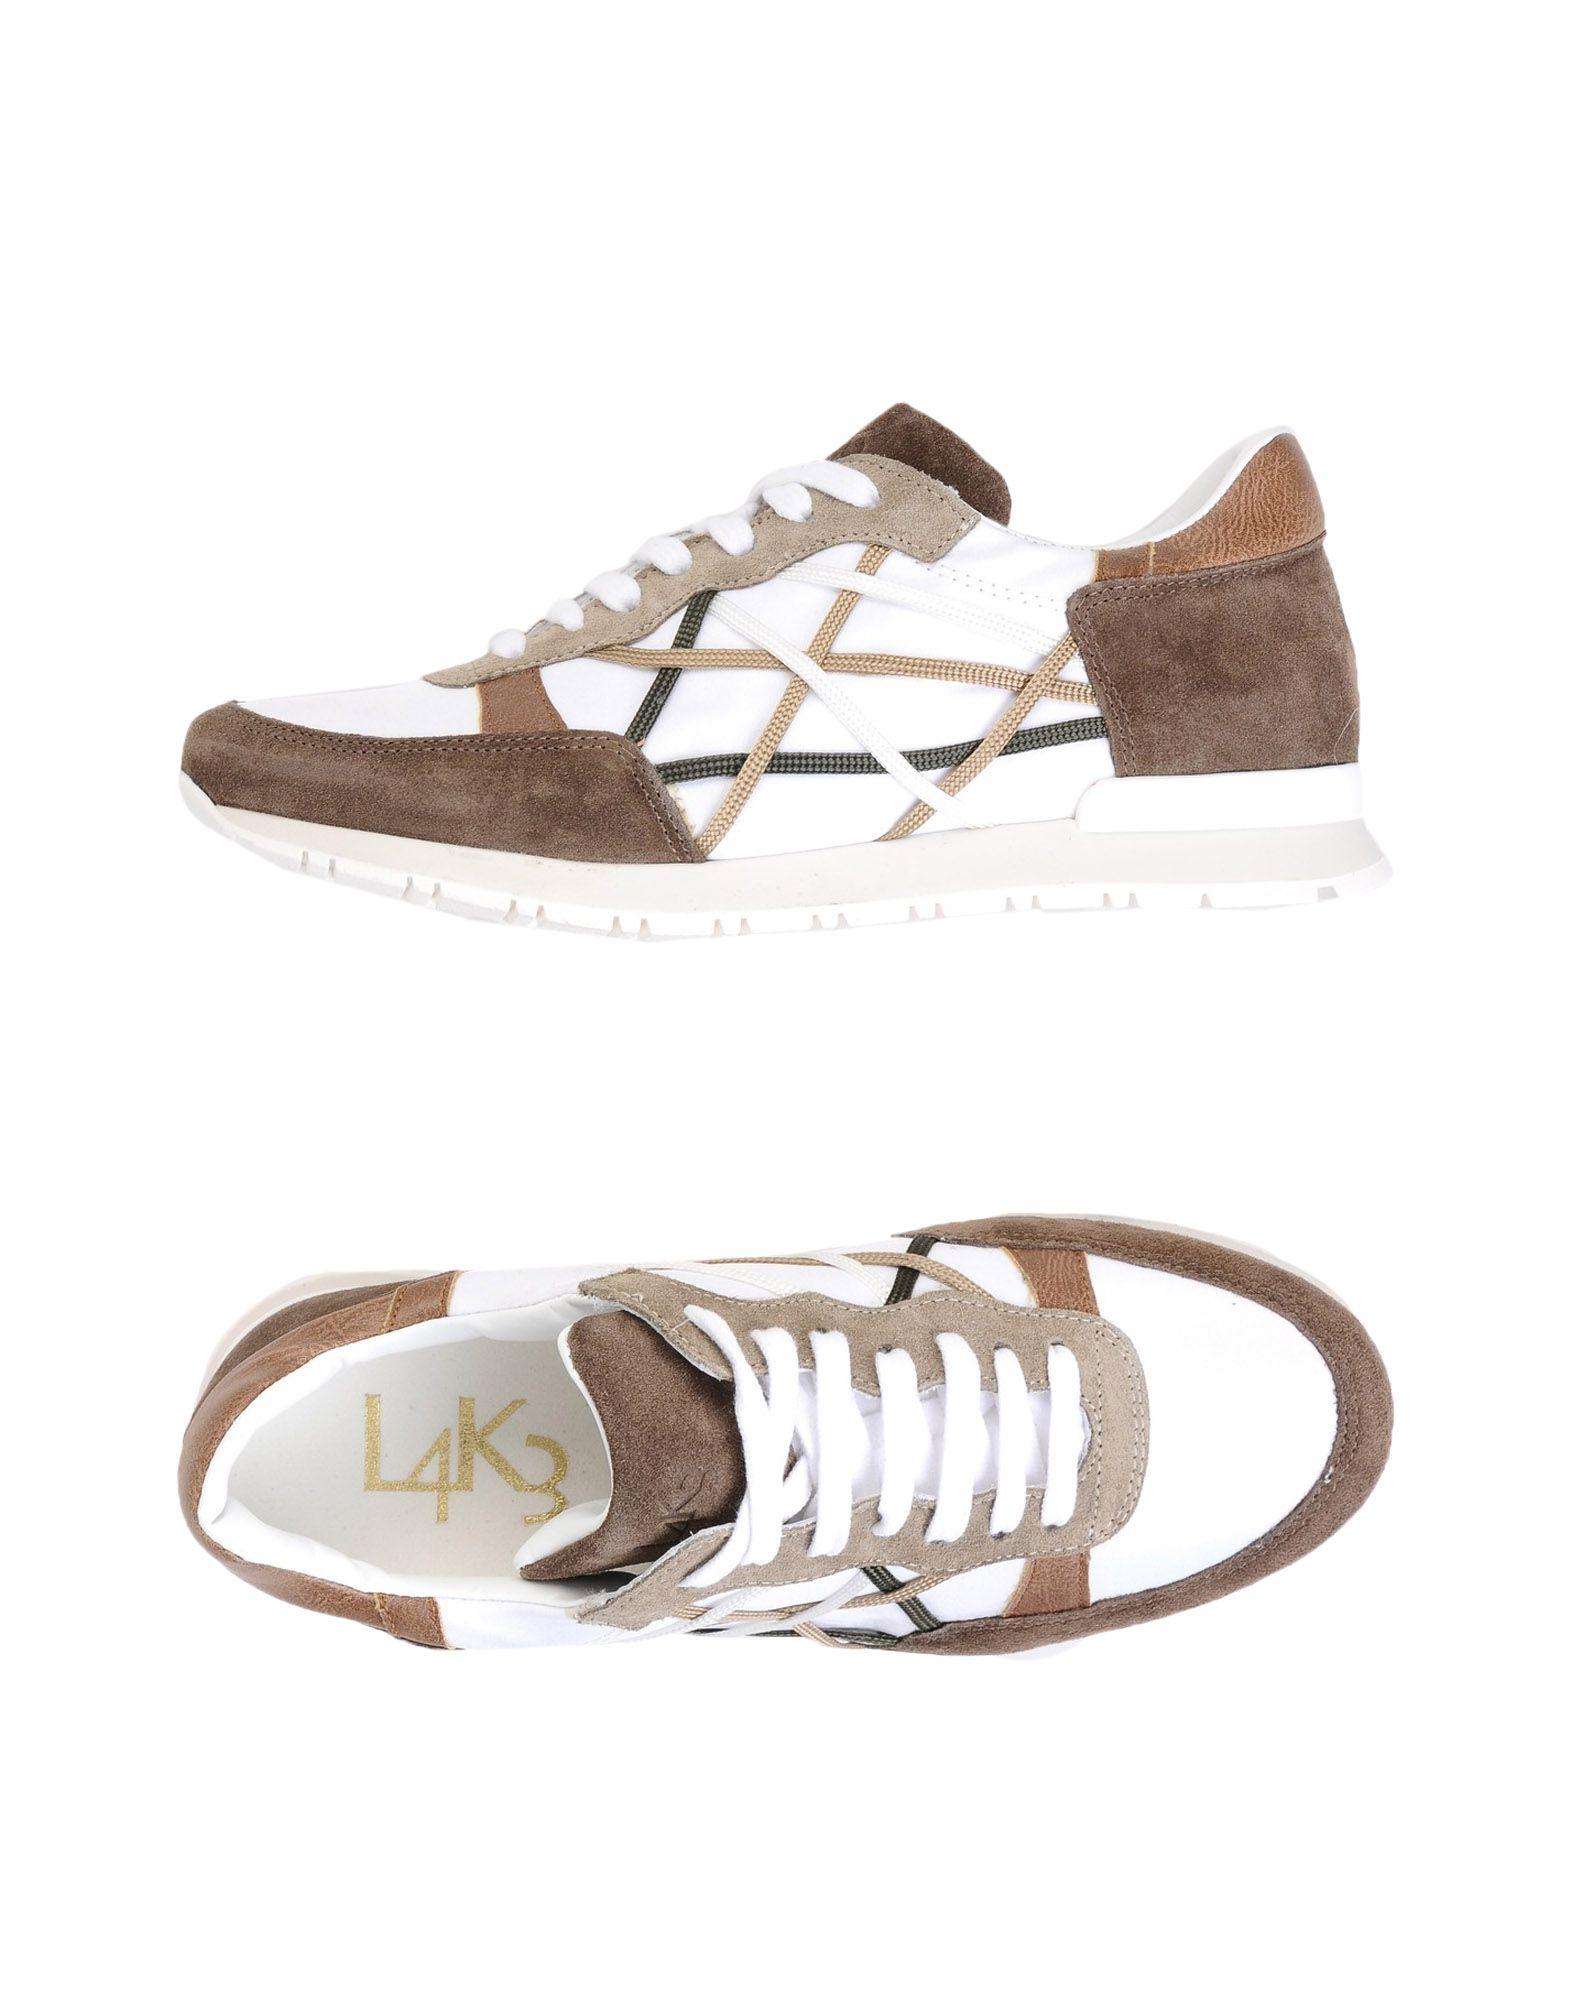 Sneakers L4k3 Mr Big Vintage - Donna - Acquista online su